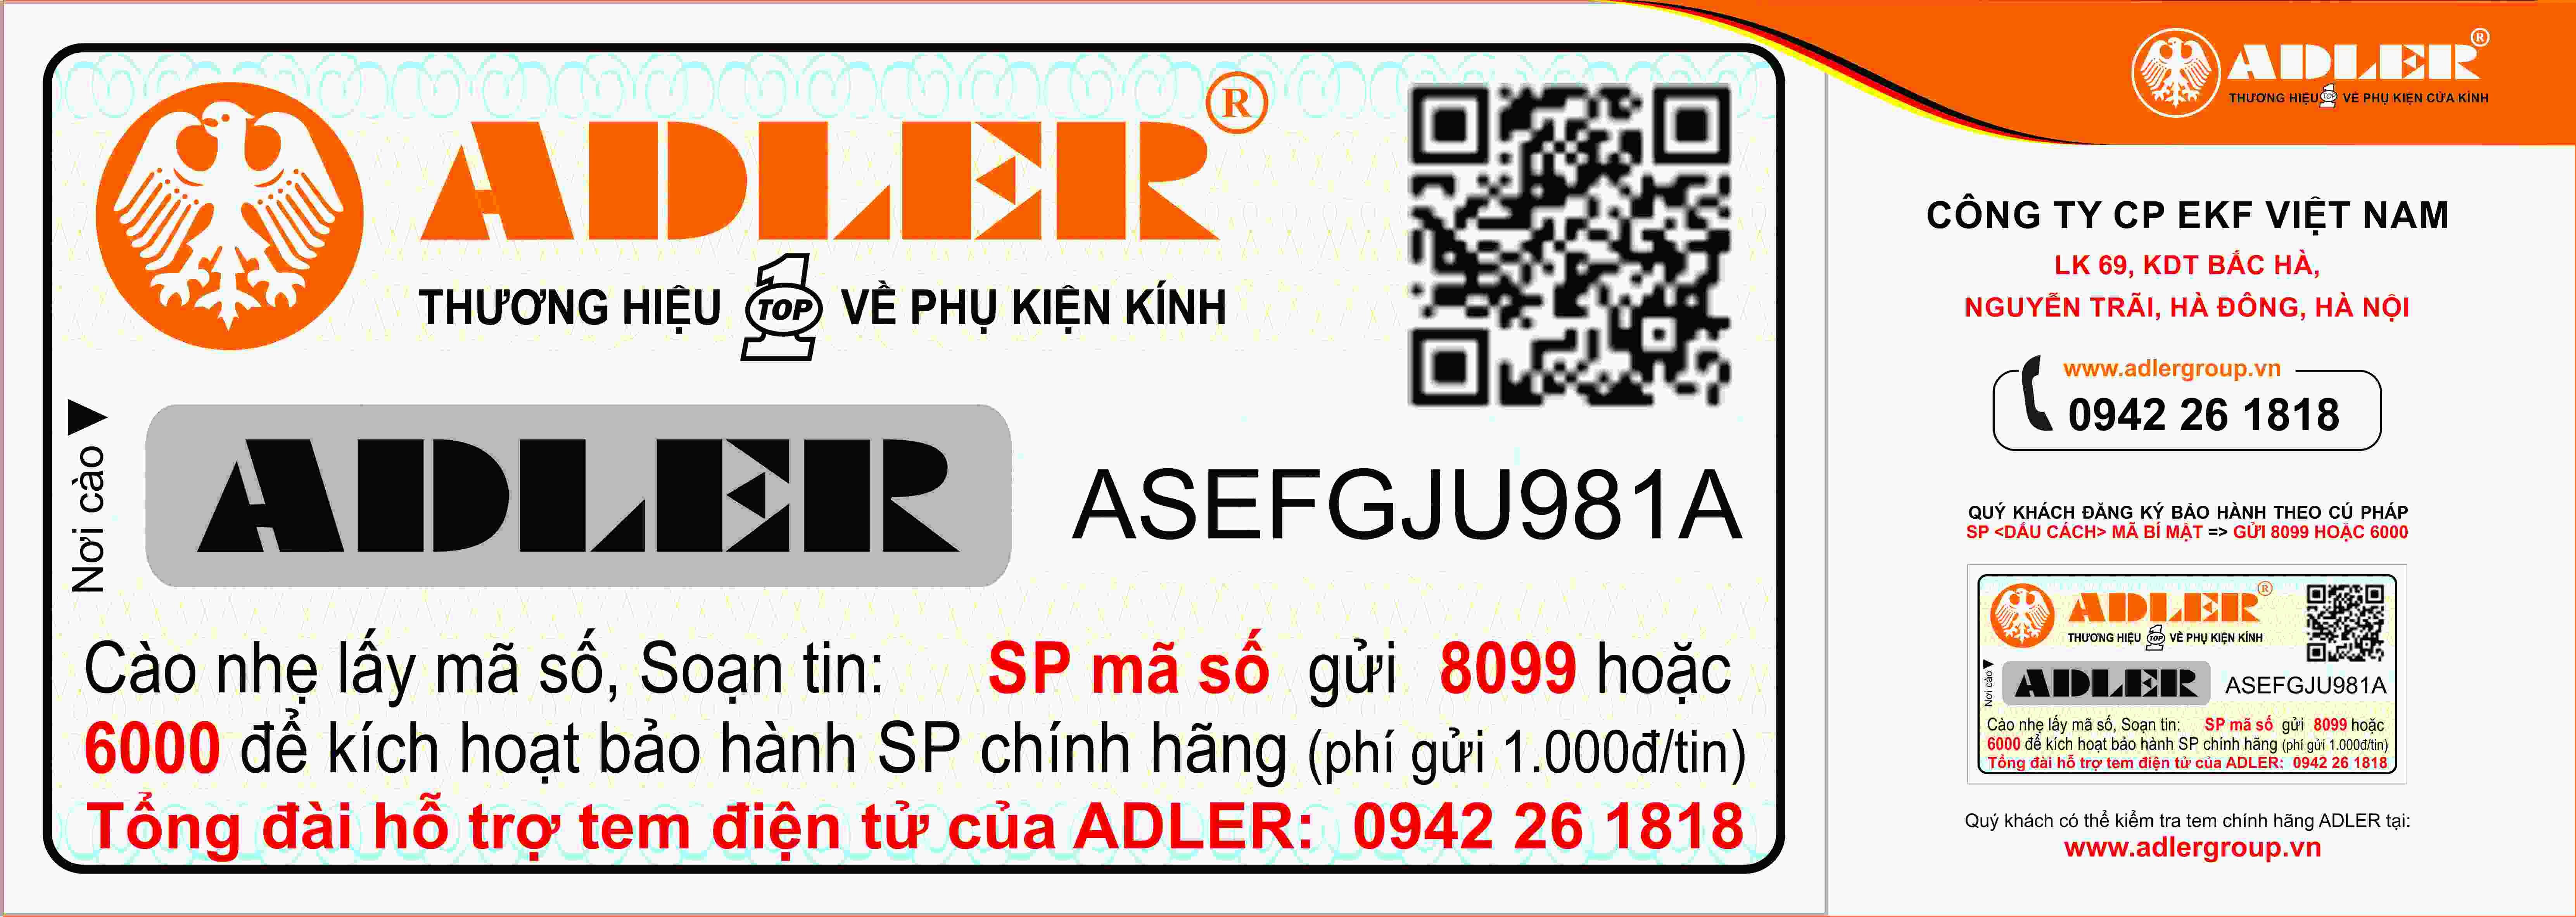 Tem bảo hành sản phẩm Adler